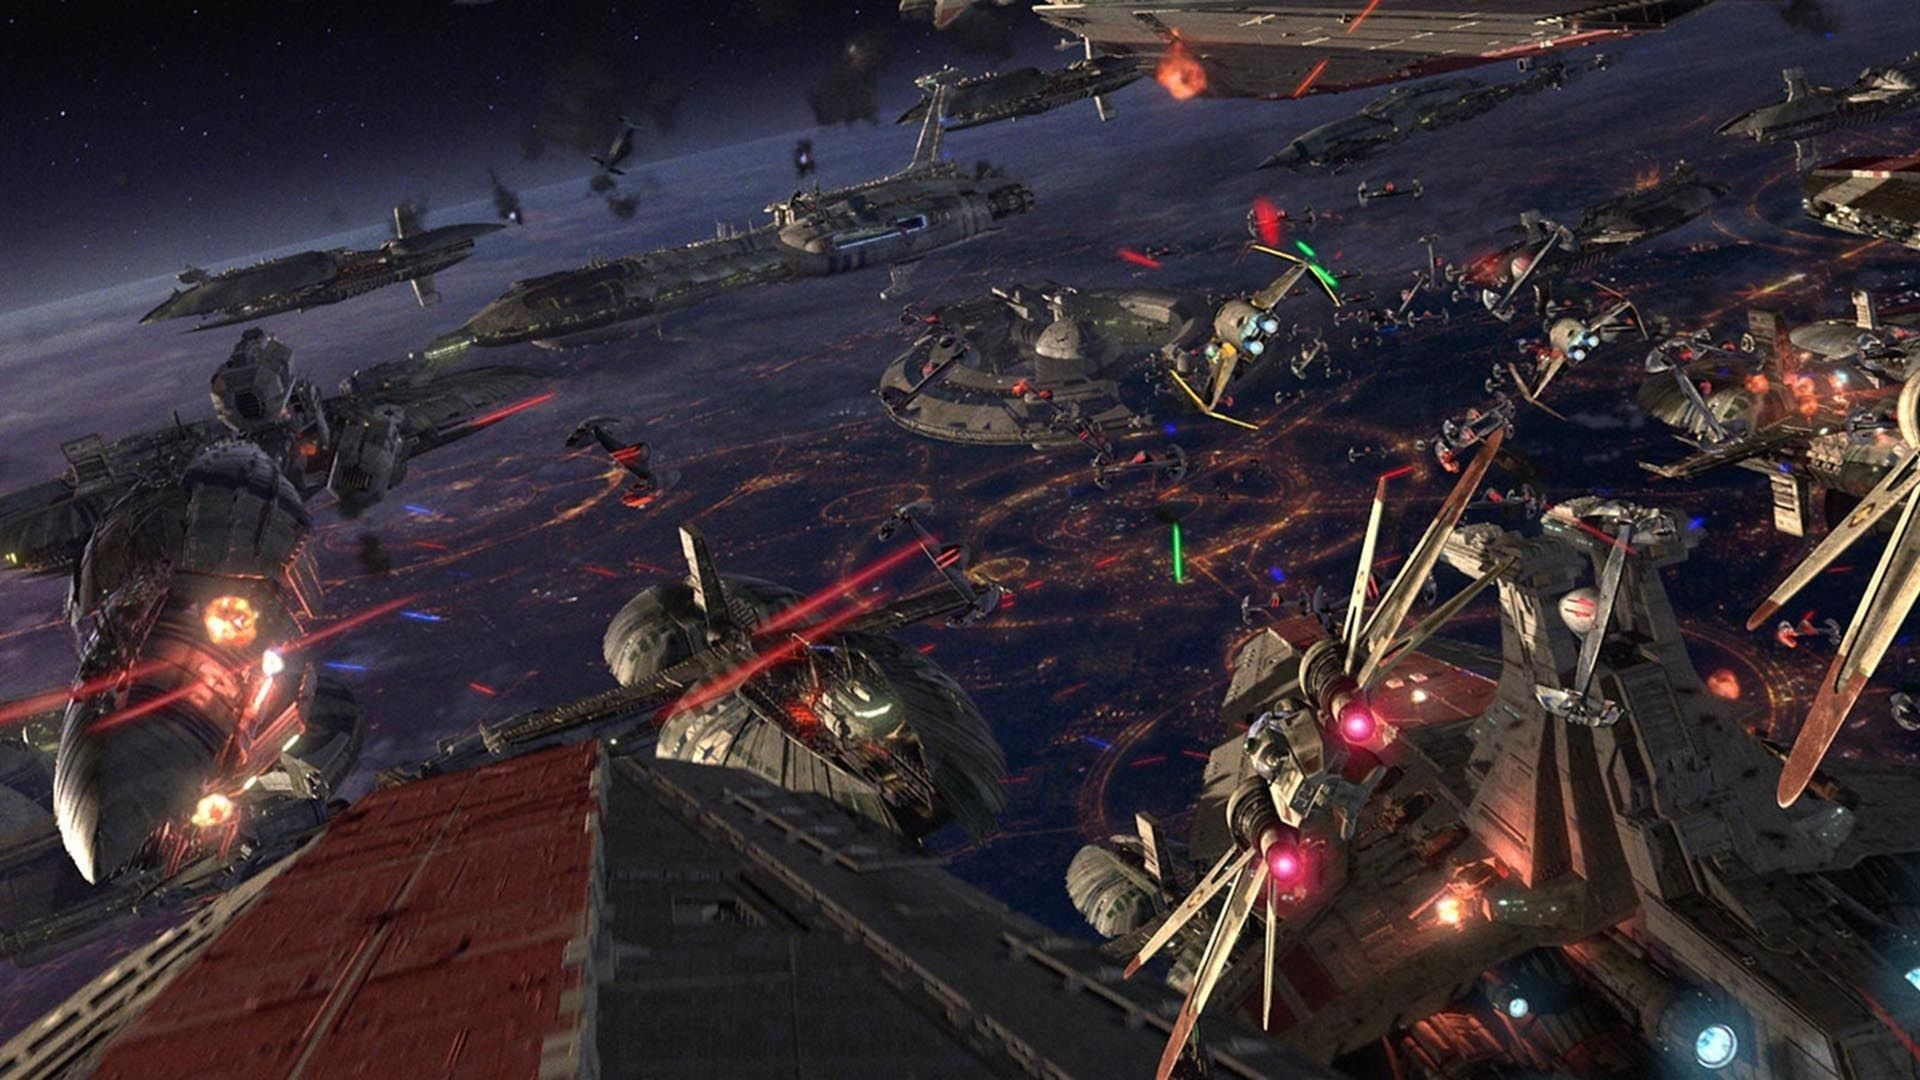 Star Wars Episode III Revenge of the Sith sci-fi battle spaceship .